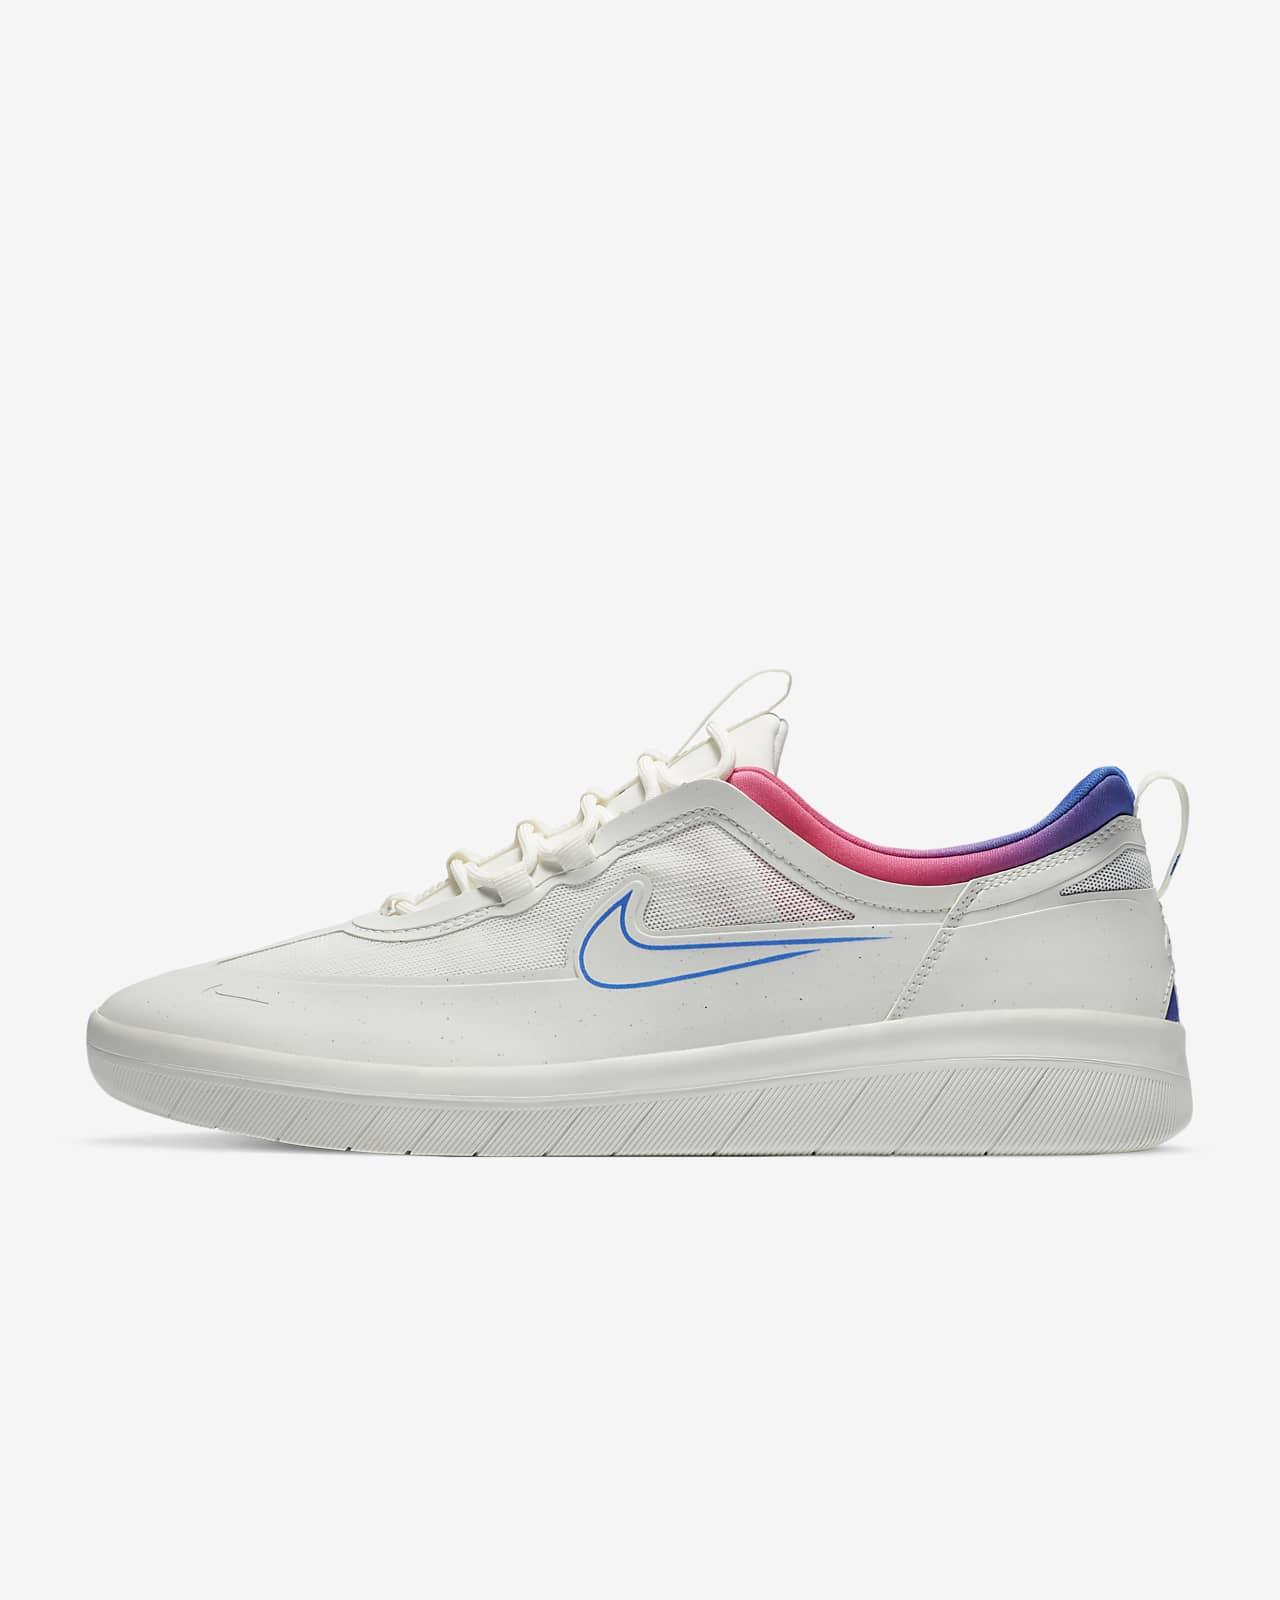 Nike SB Nyjah Free 2 T 男/女滑板鞋